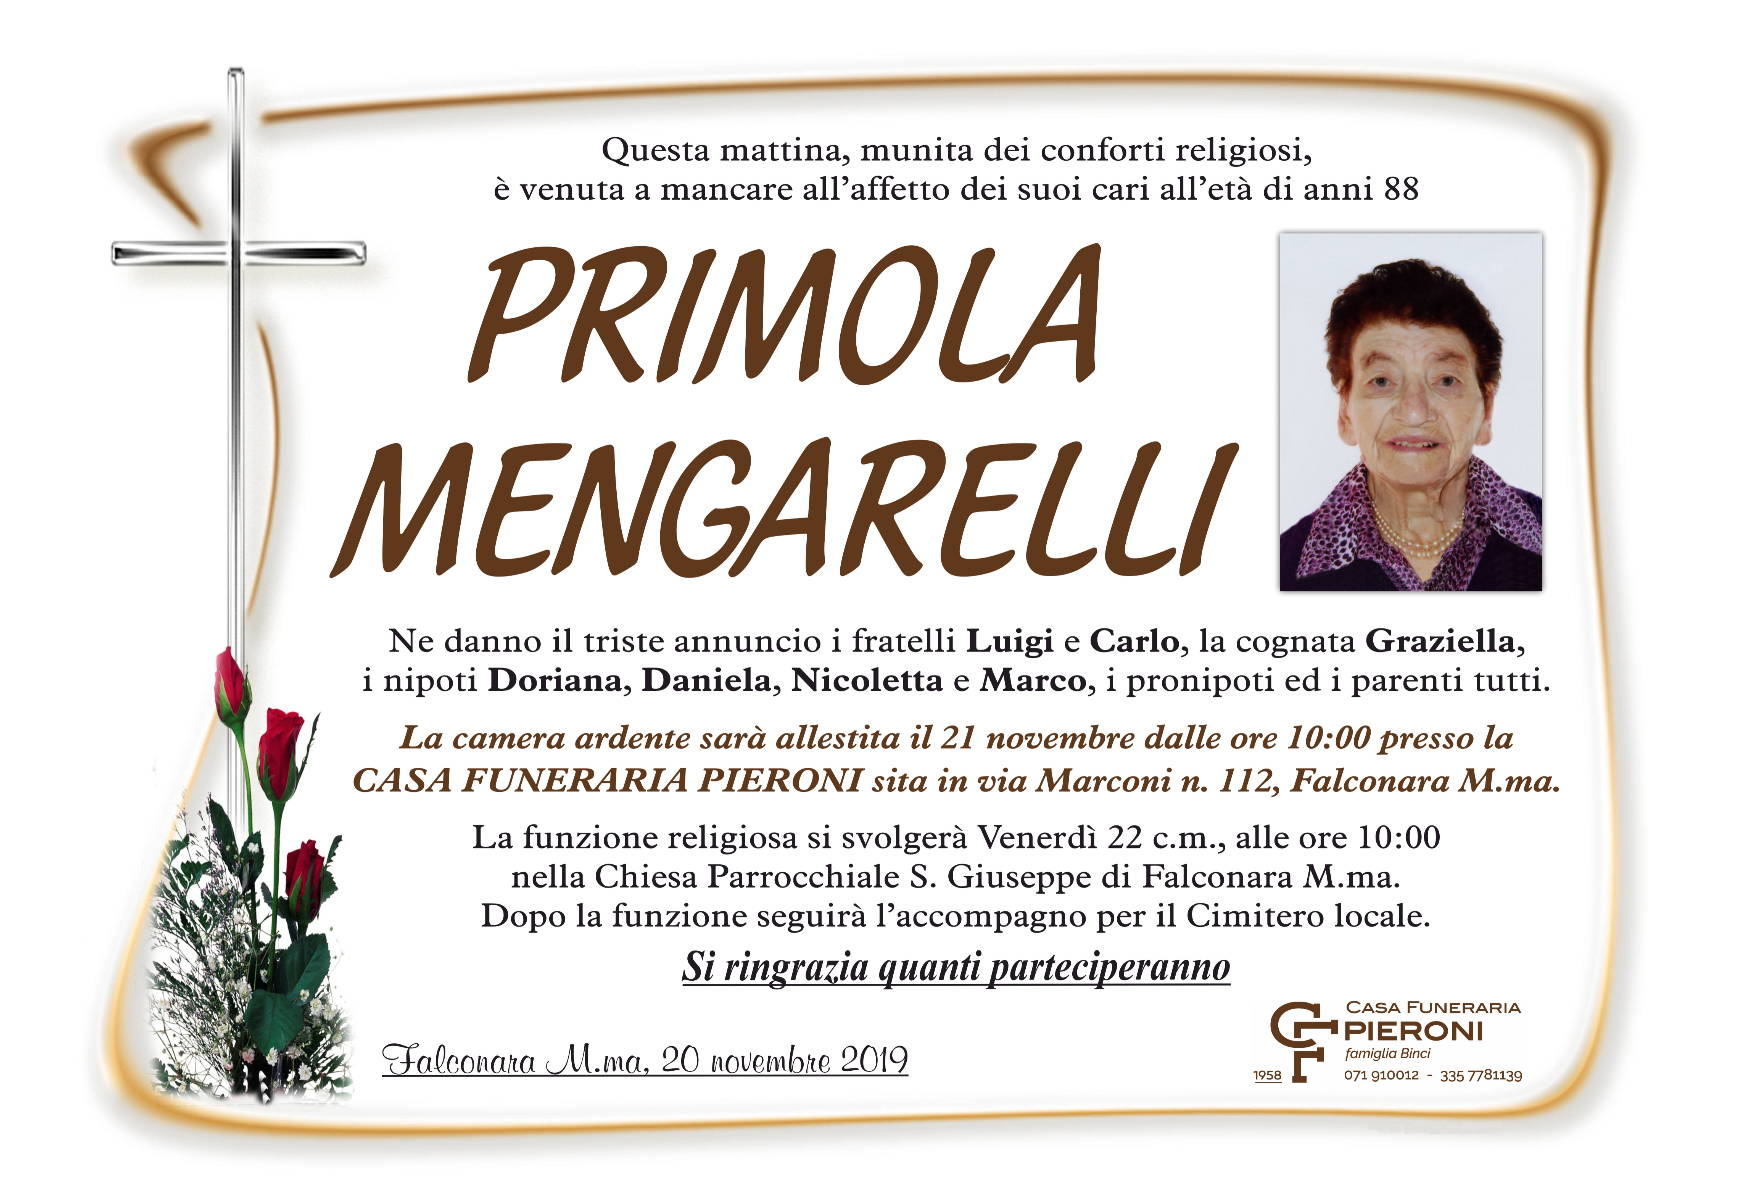 Primola Mengarelli